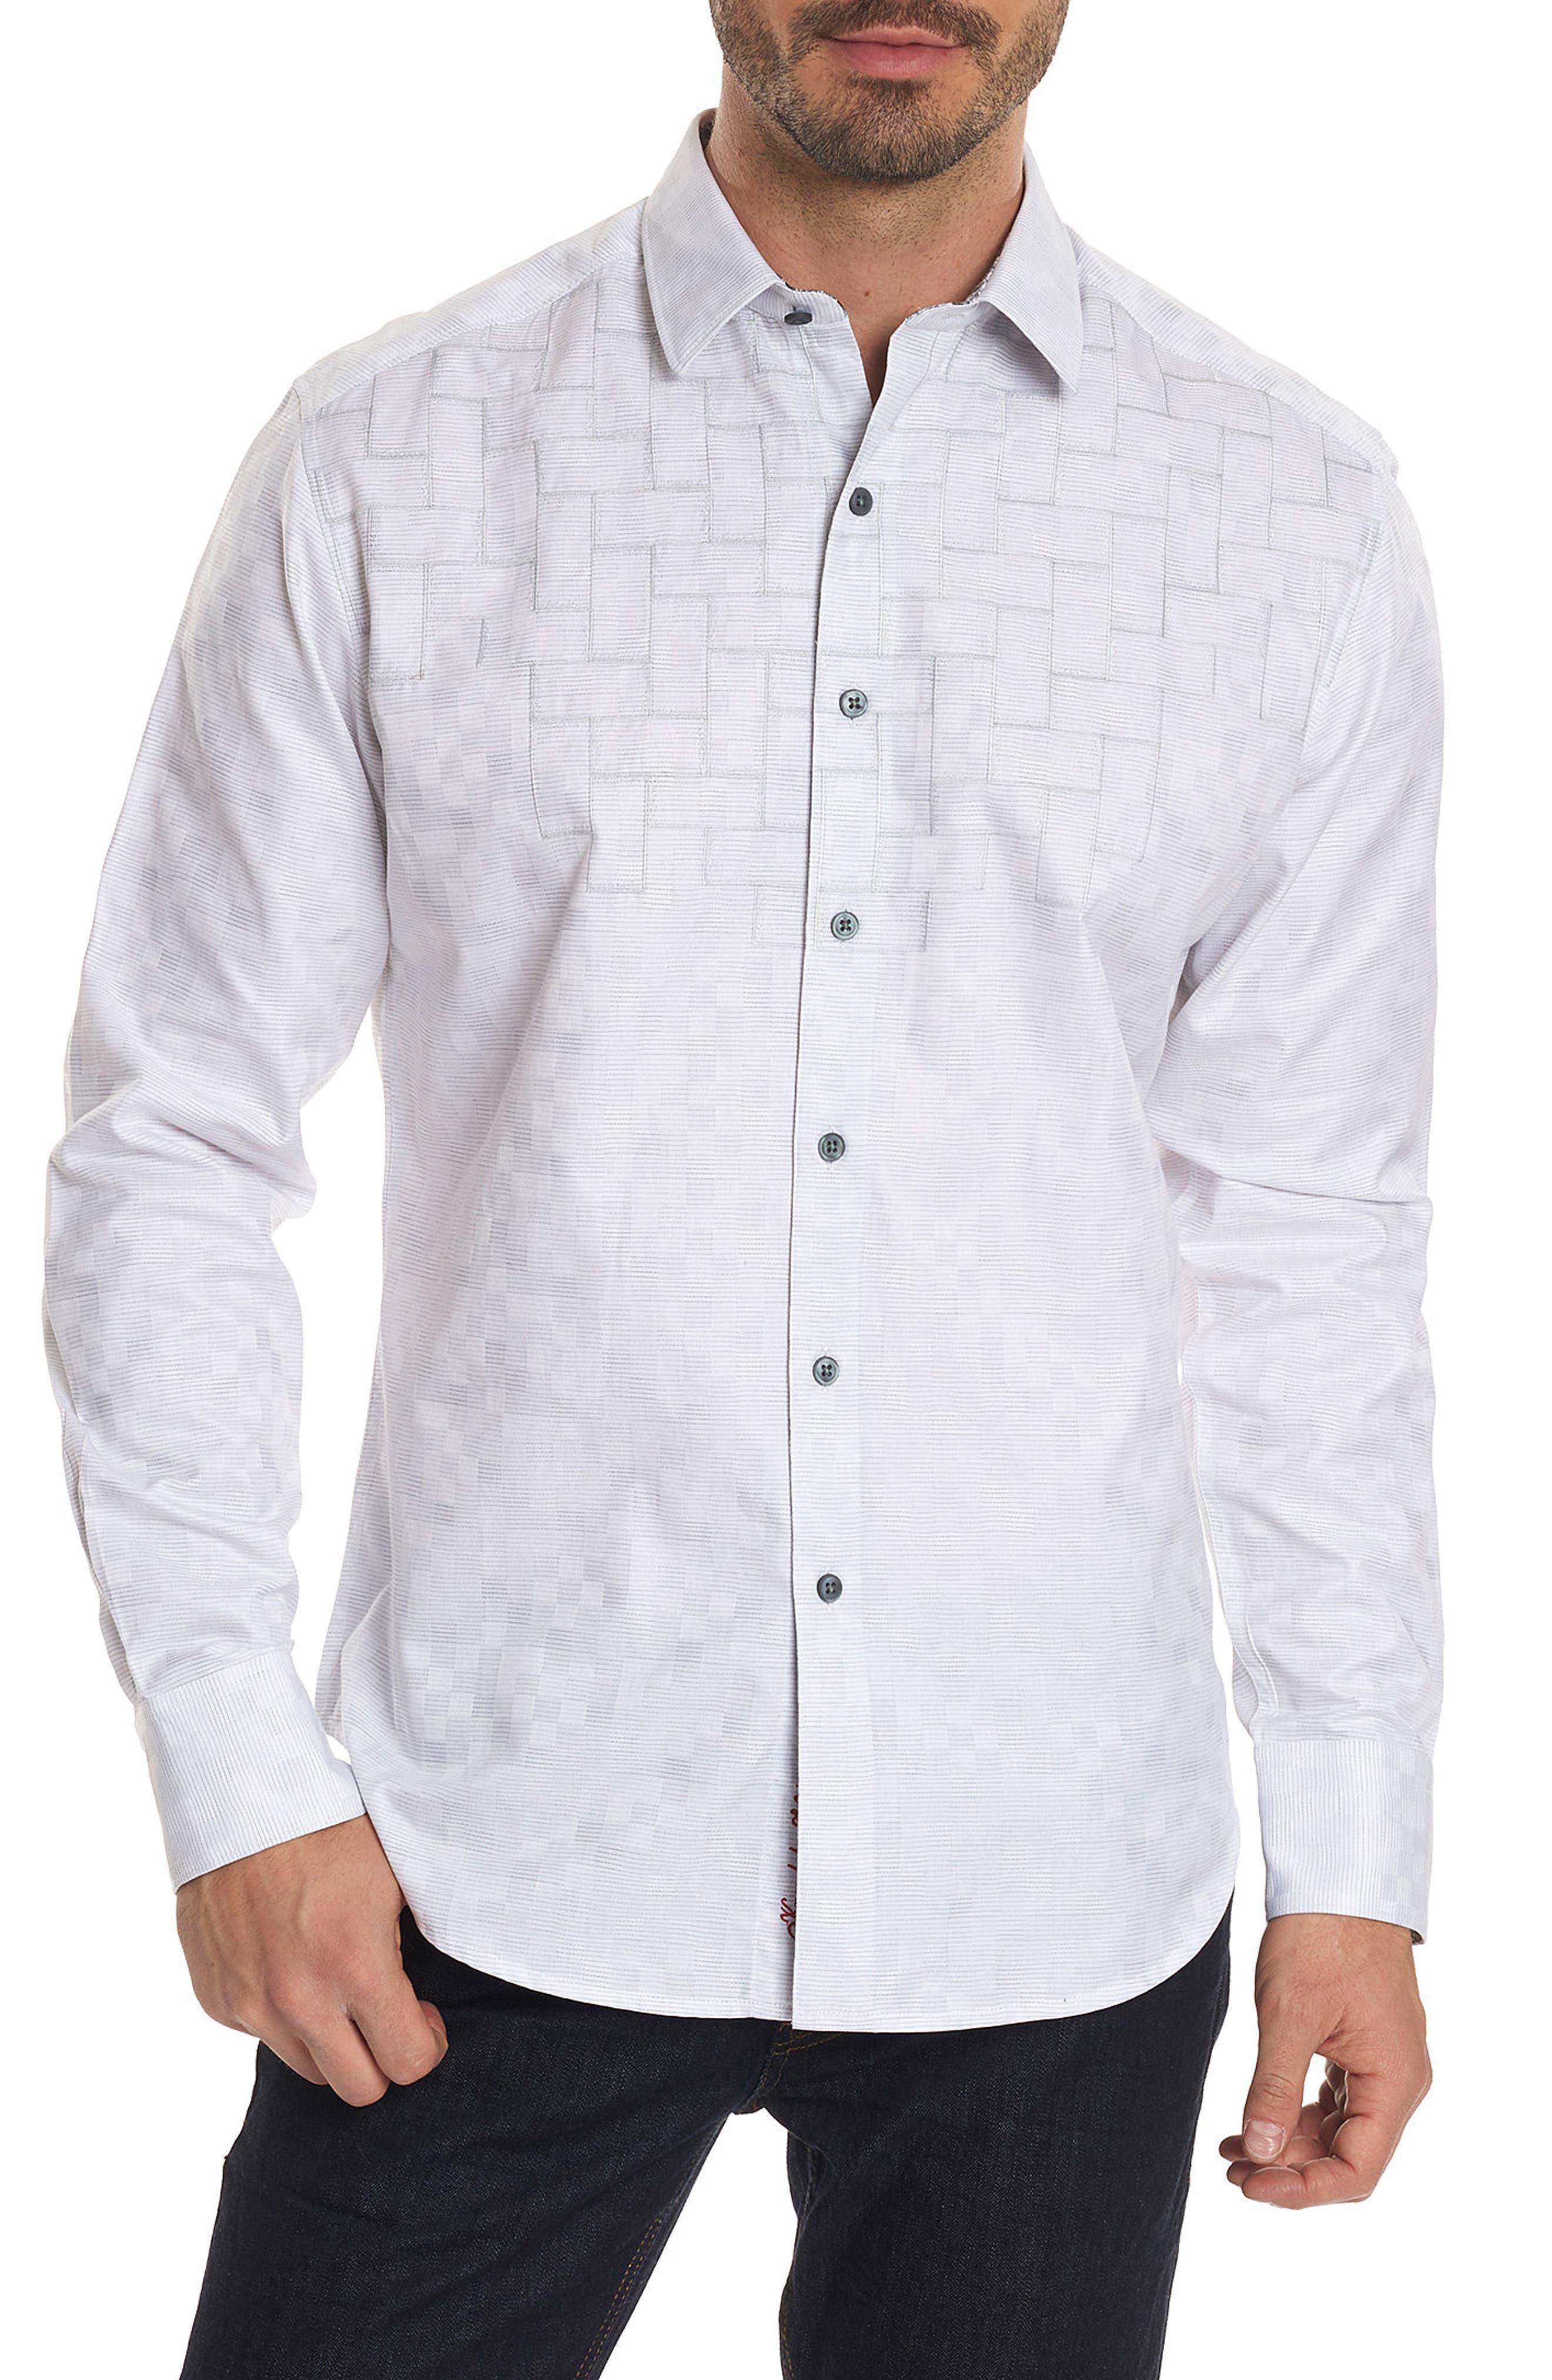 Alternate Image 1 Selected - Robert Graham Transient Classic Fit Print Sport Shirt